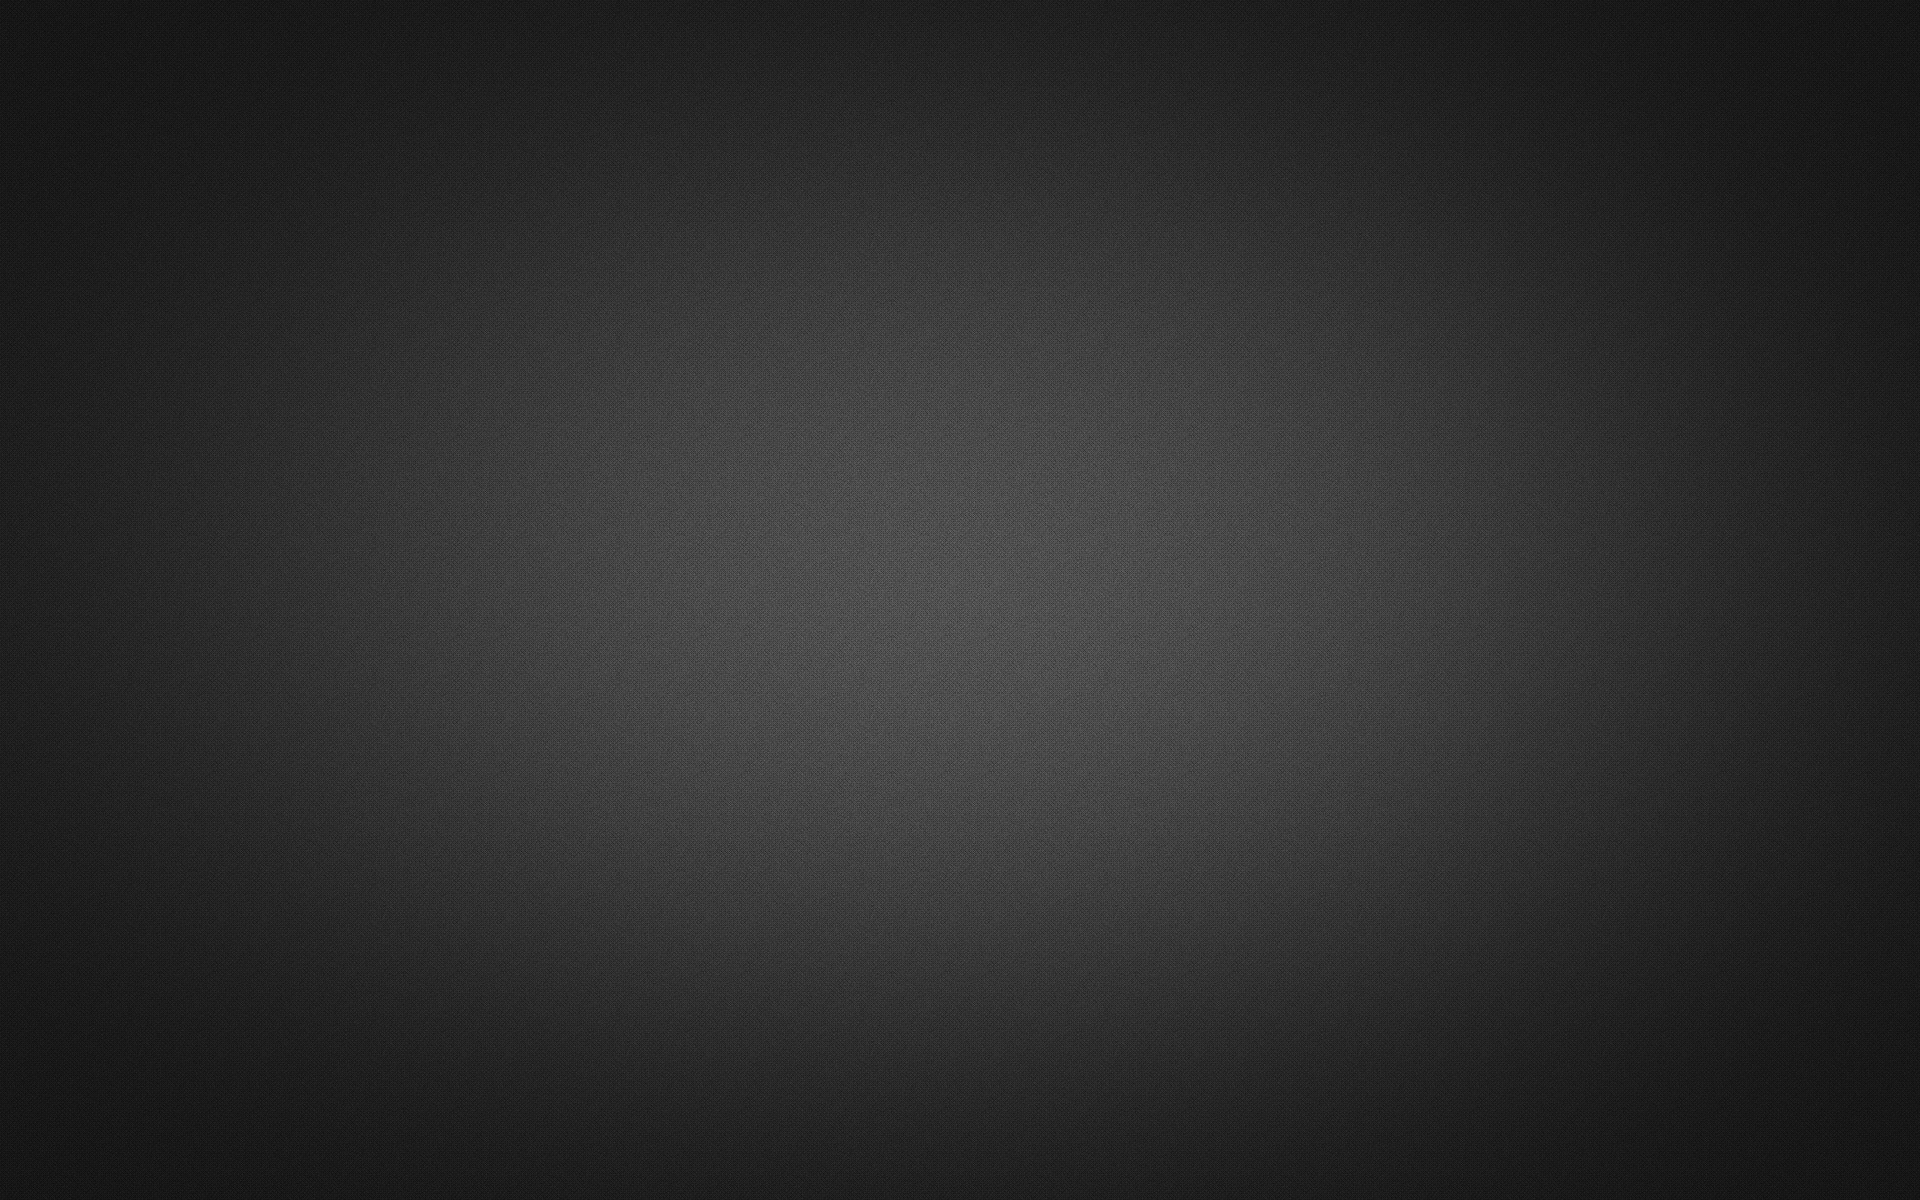 black and gray backgrounds wallpapersafari. Black Bedroom Furniture Sets. Home Design Ideas